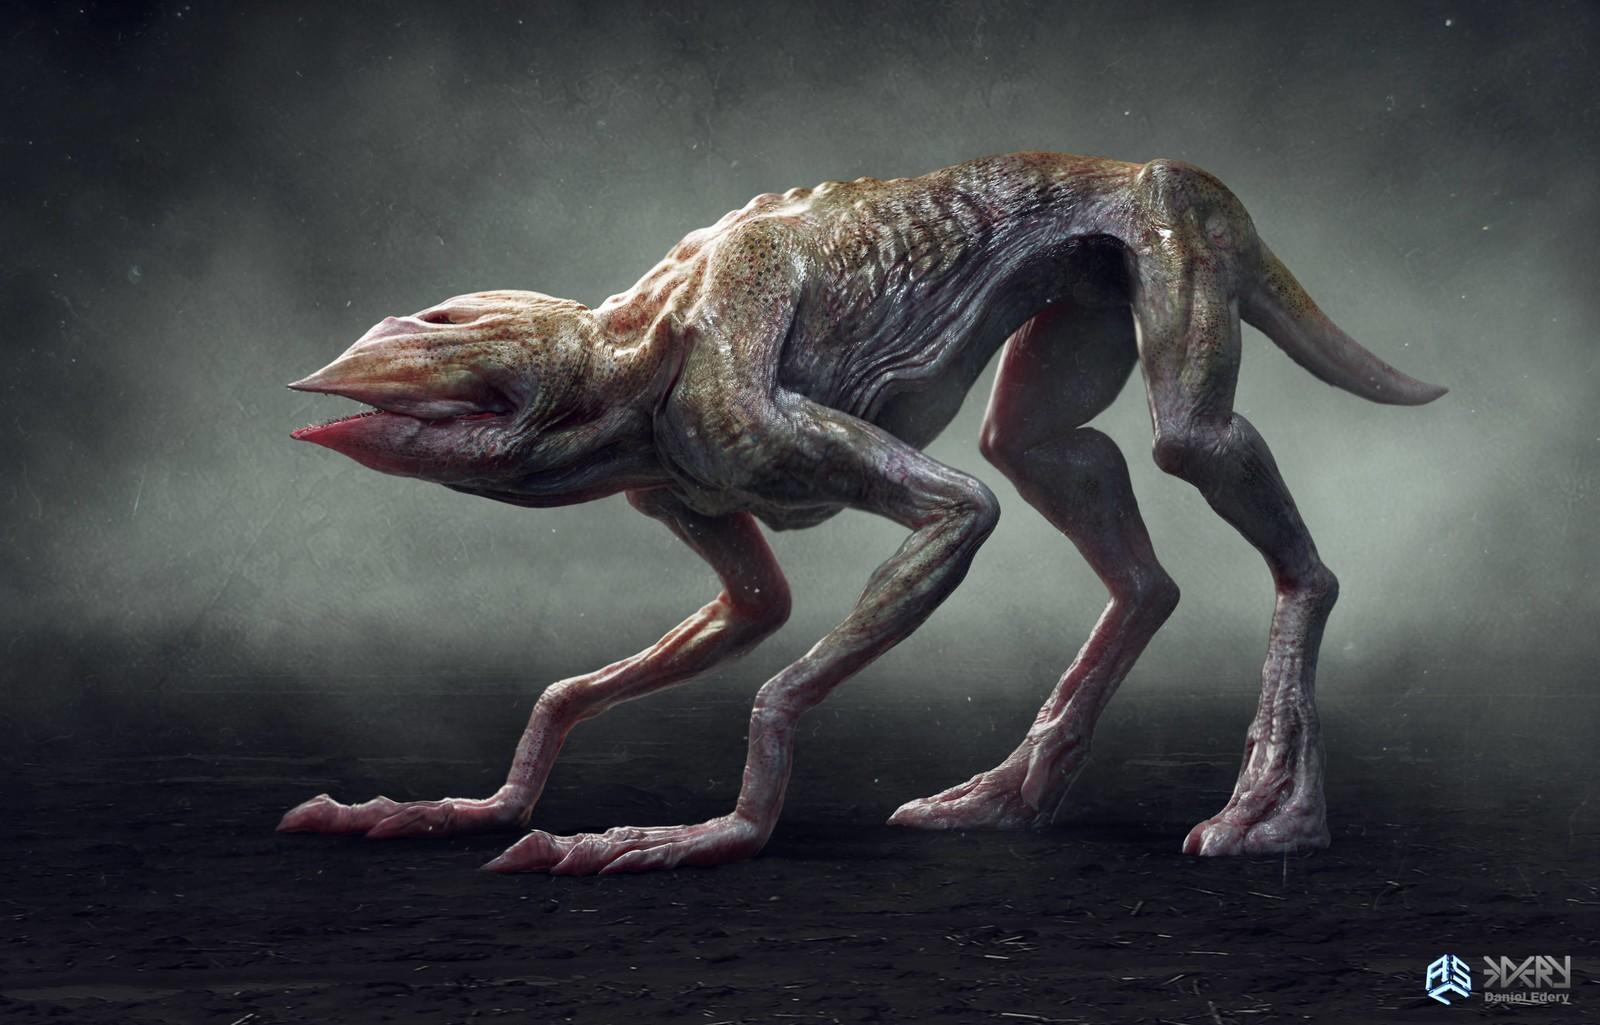 The Demo-Dog Final Concept Design for Stranger Things Season 2.